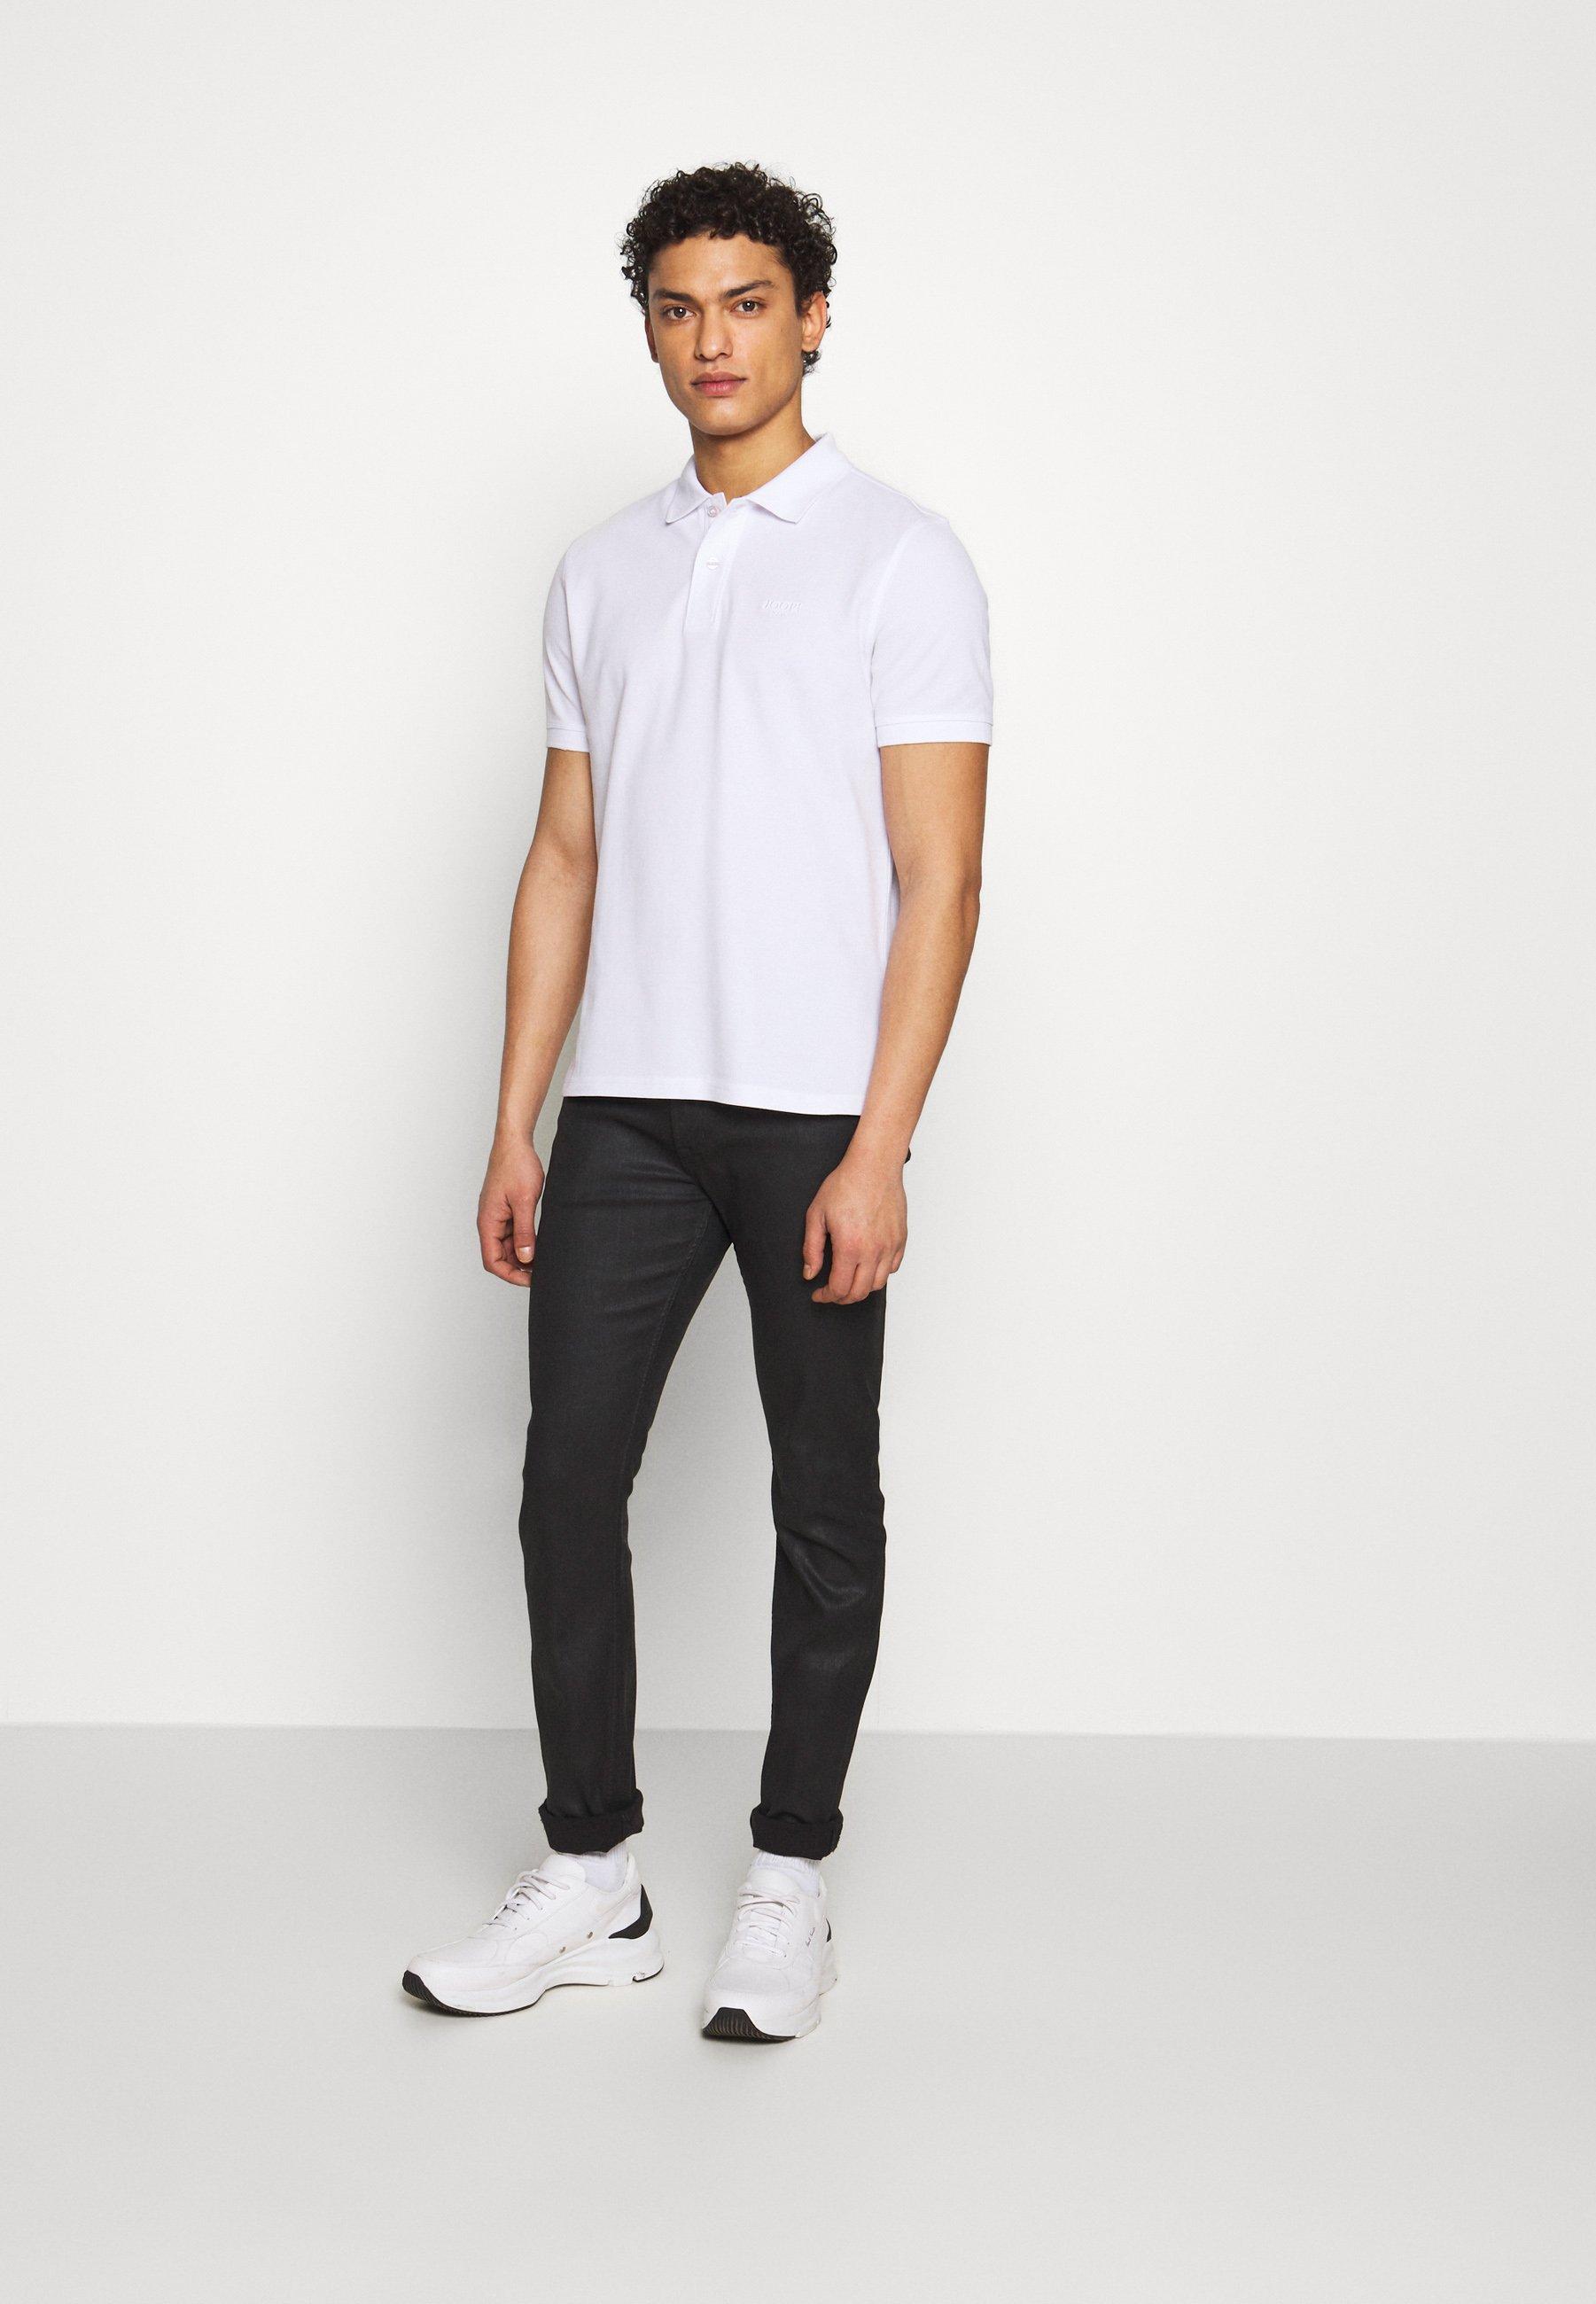 Joop! Jeans Beeke - Pikeepaita White